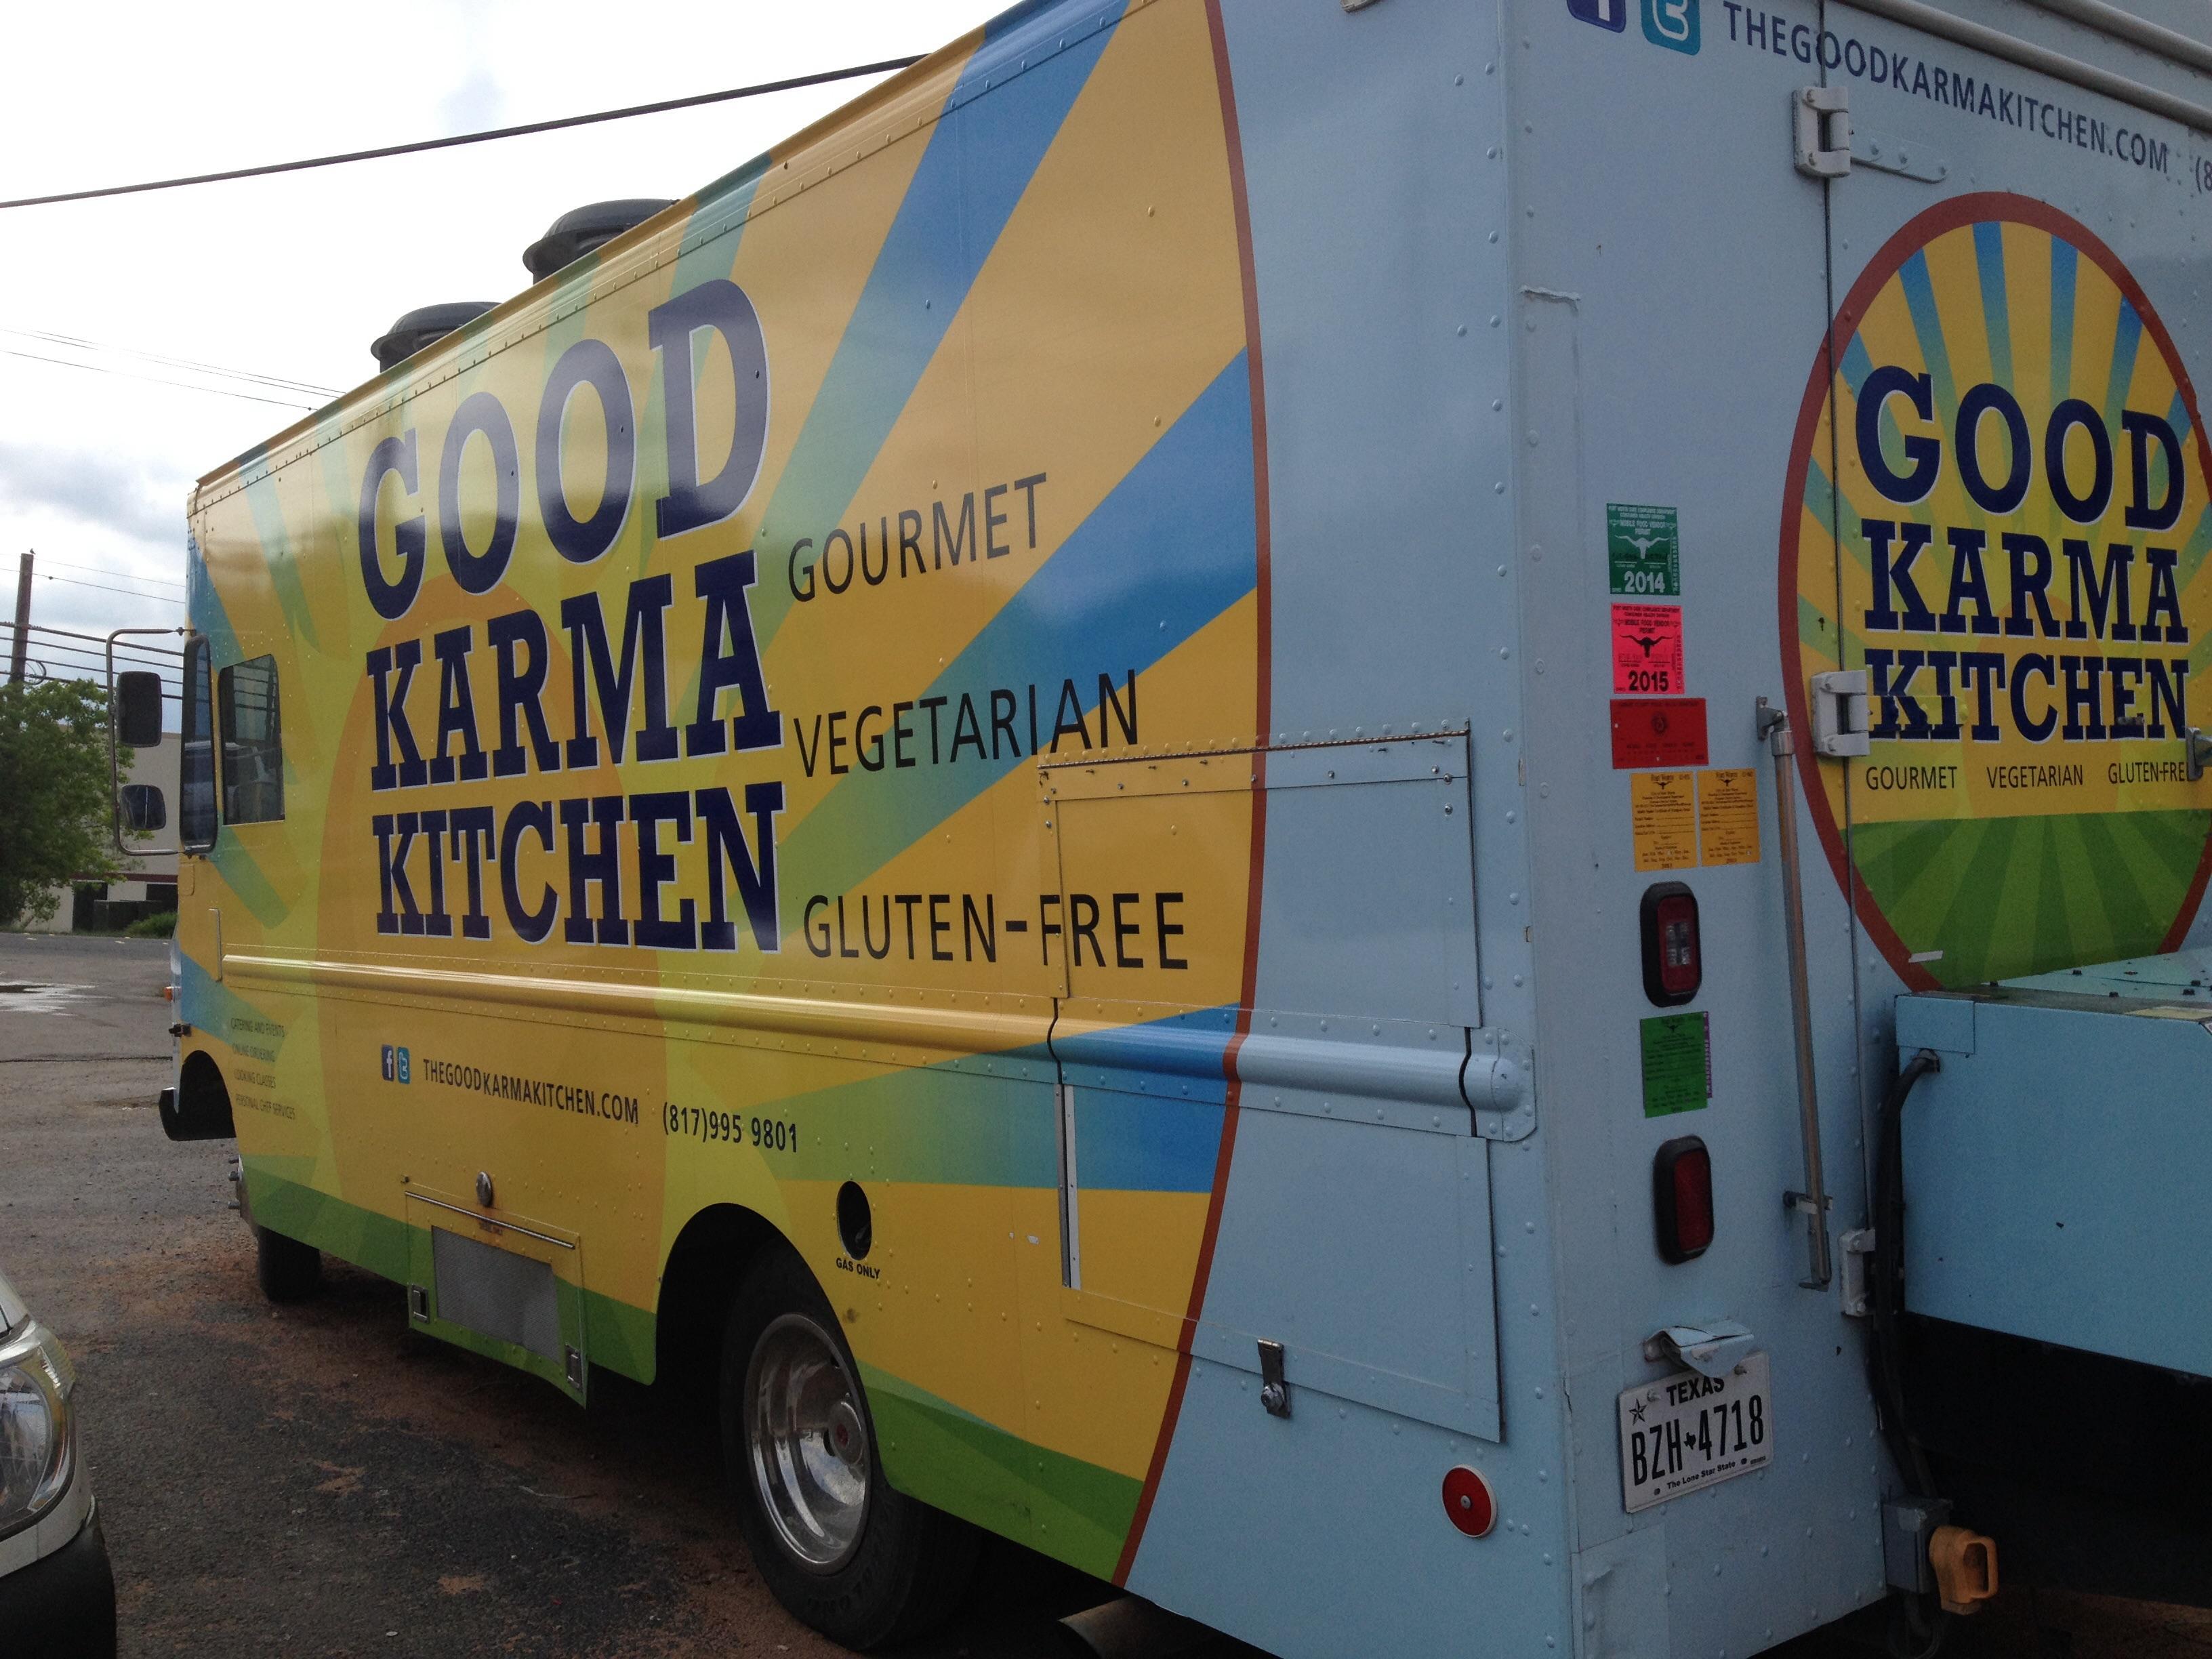 karma kitchen food truck for sale in san antonio texas. Black Bedroom Furniture Sets. Home Design Ideas